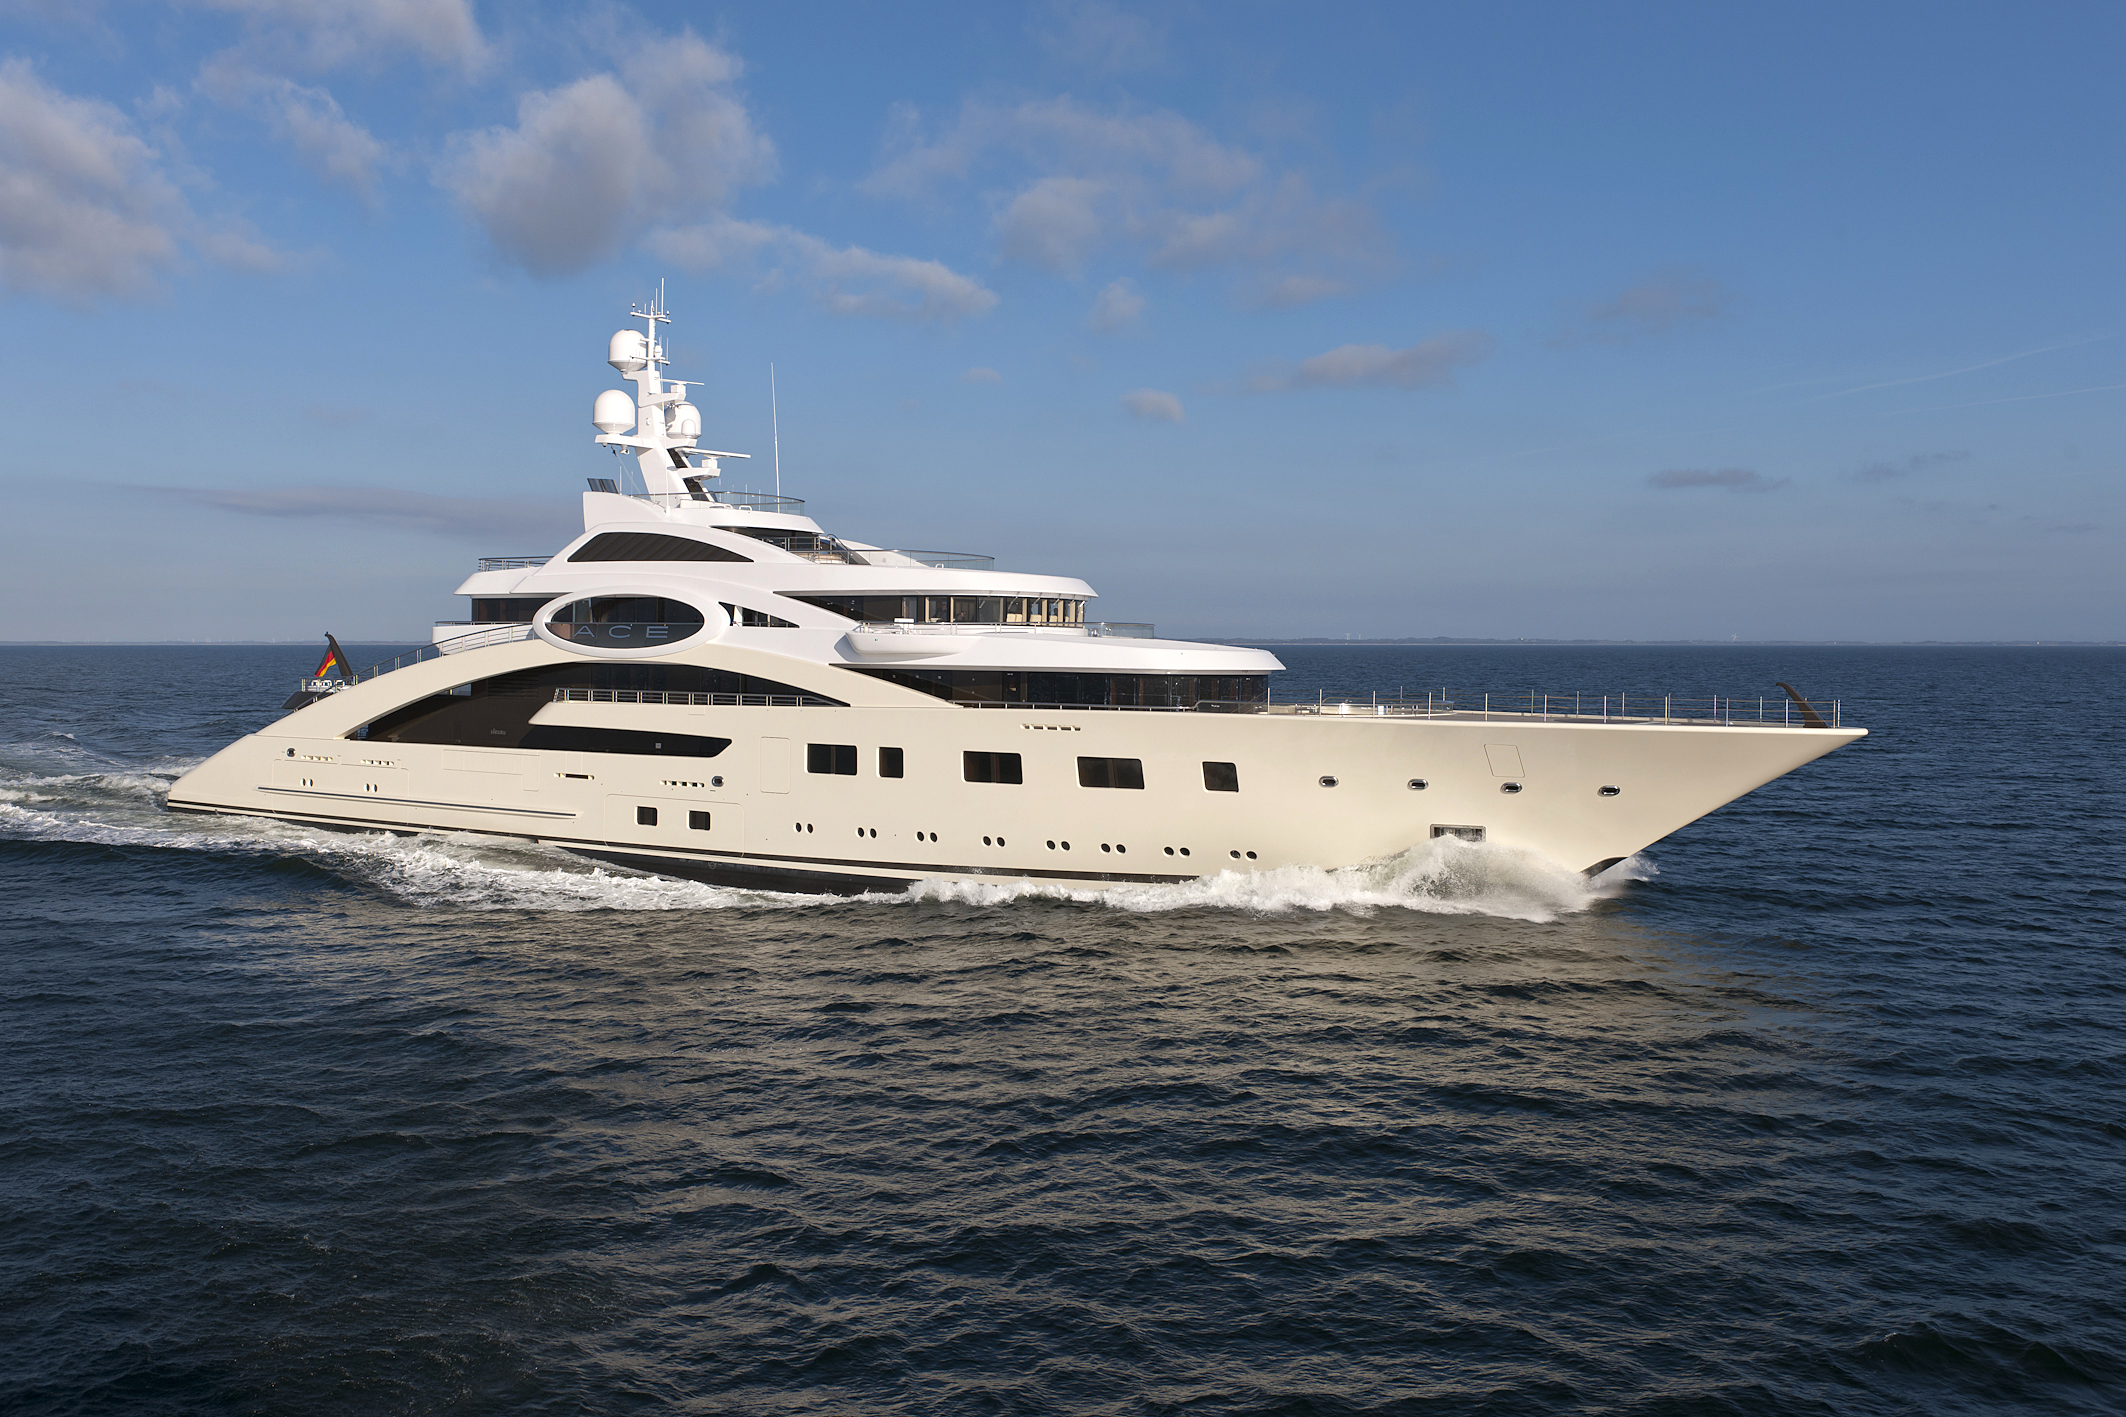 85m Luxury Motor Yacht ACE Ex Project Rocky Photo By